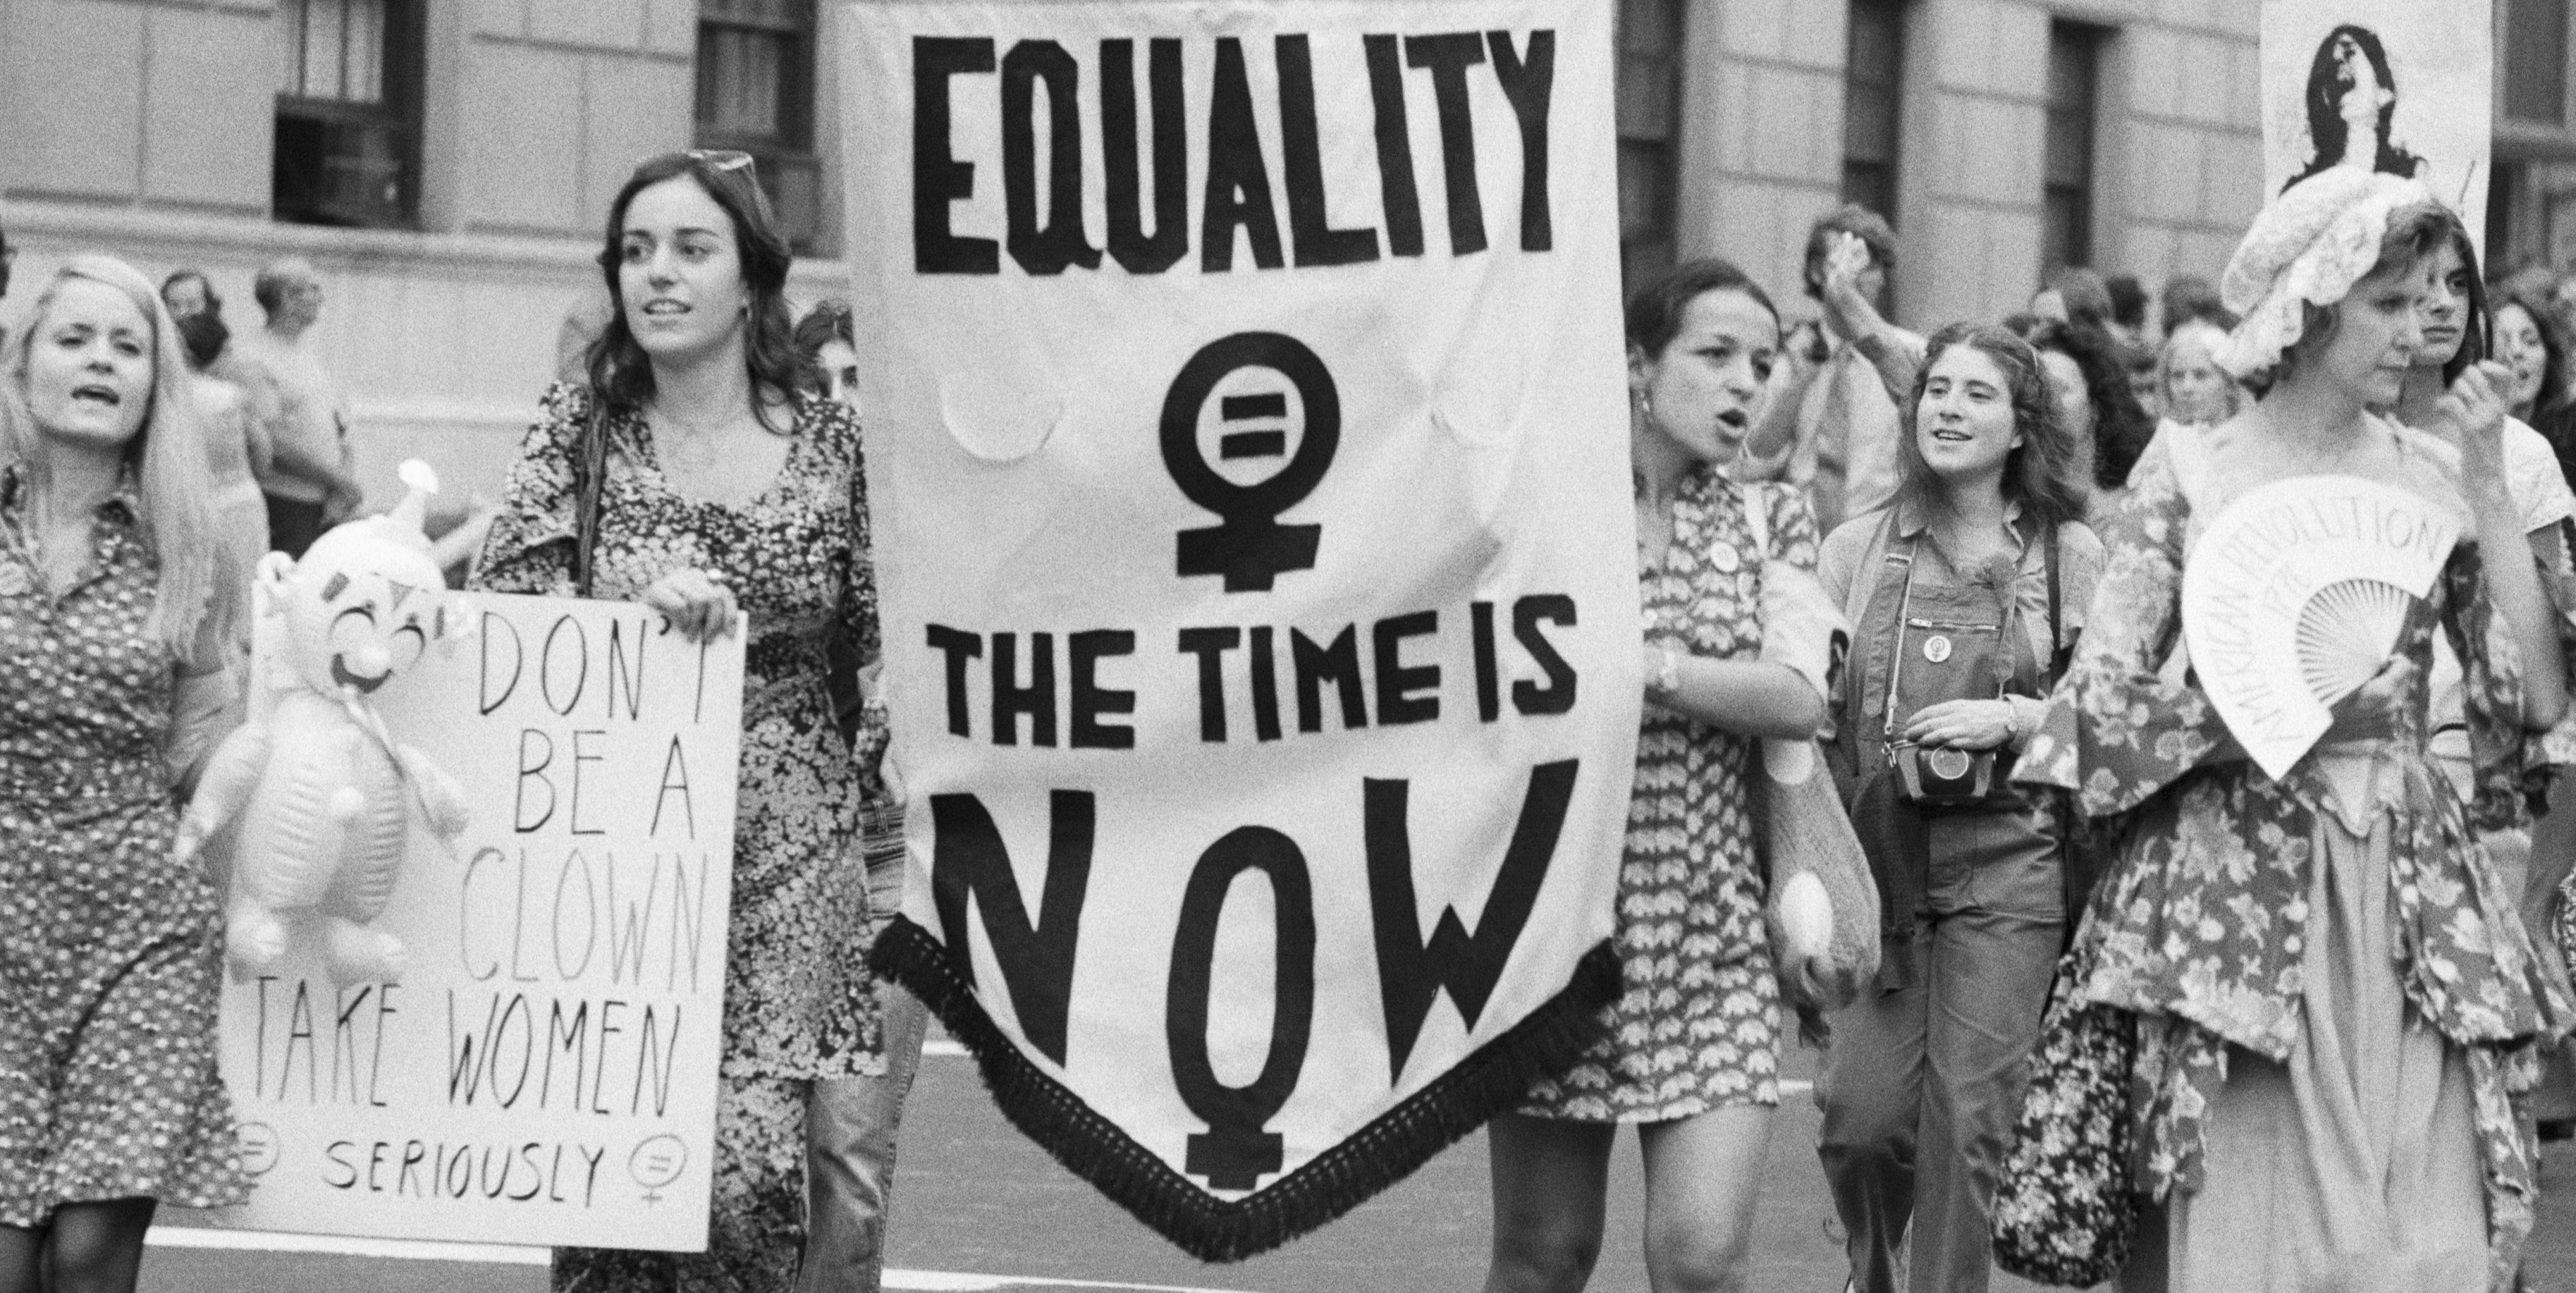 Netflix documentaires over feminisme